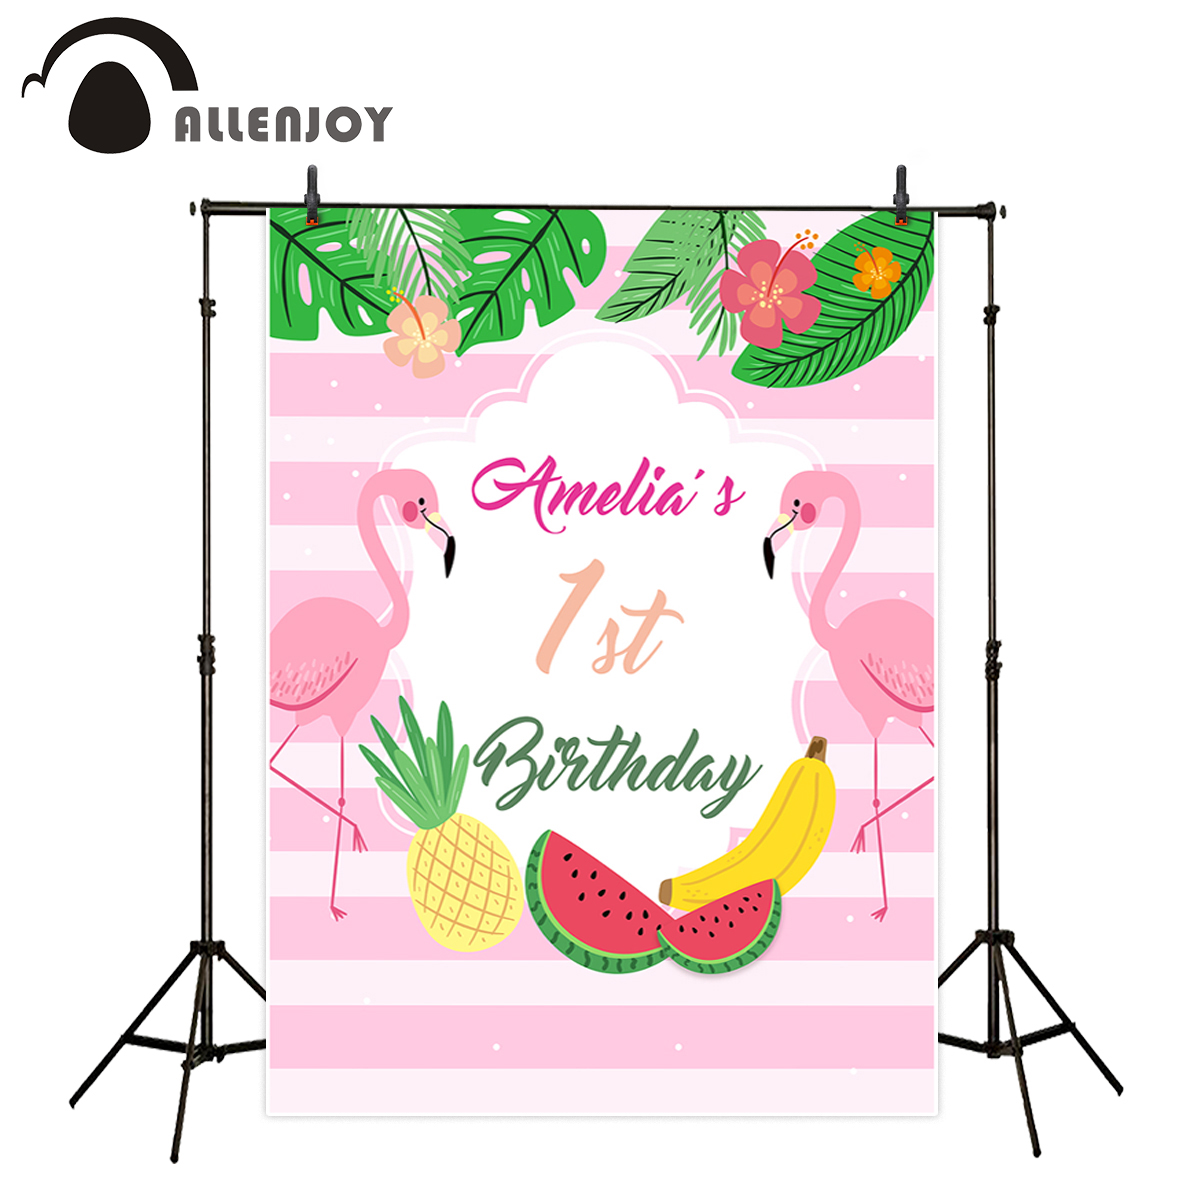 Allenjoy vinyl photo backdrops Pink striped plant watermelon birthday flamingo background photobooth newborn original design